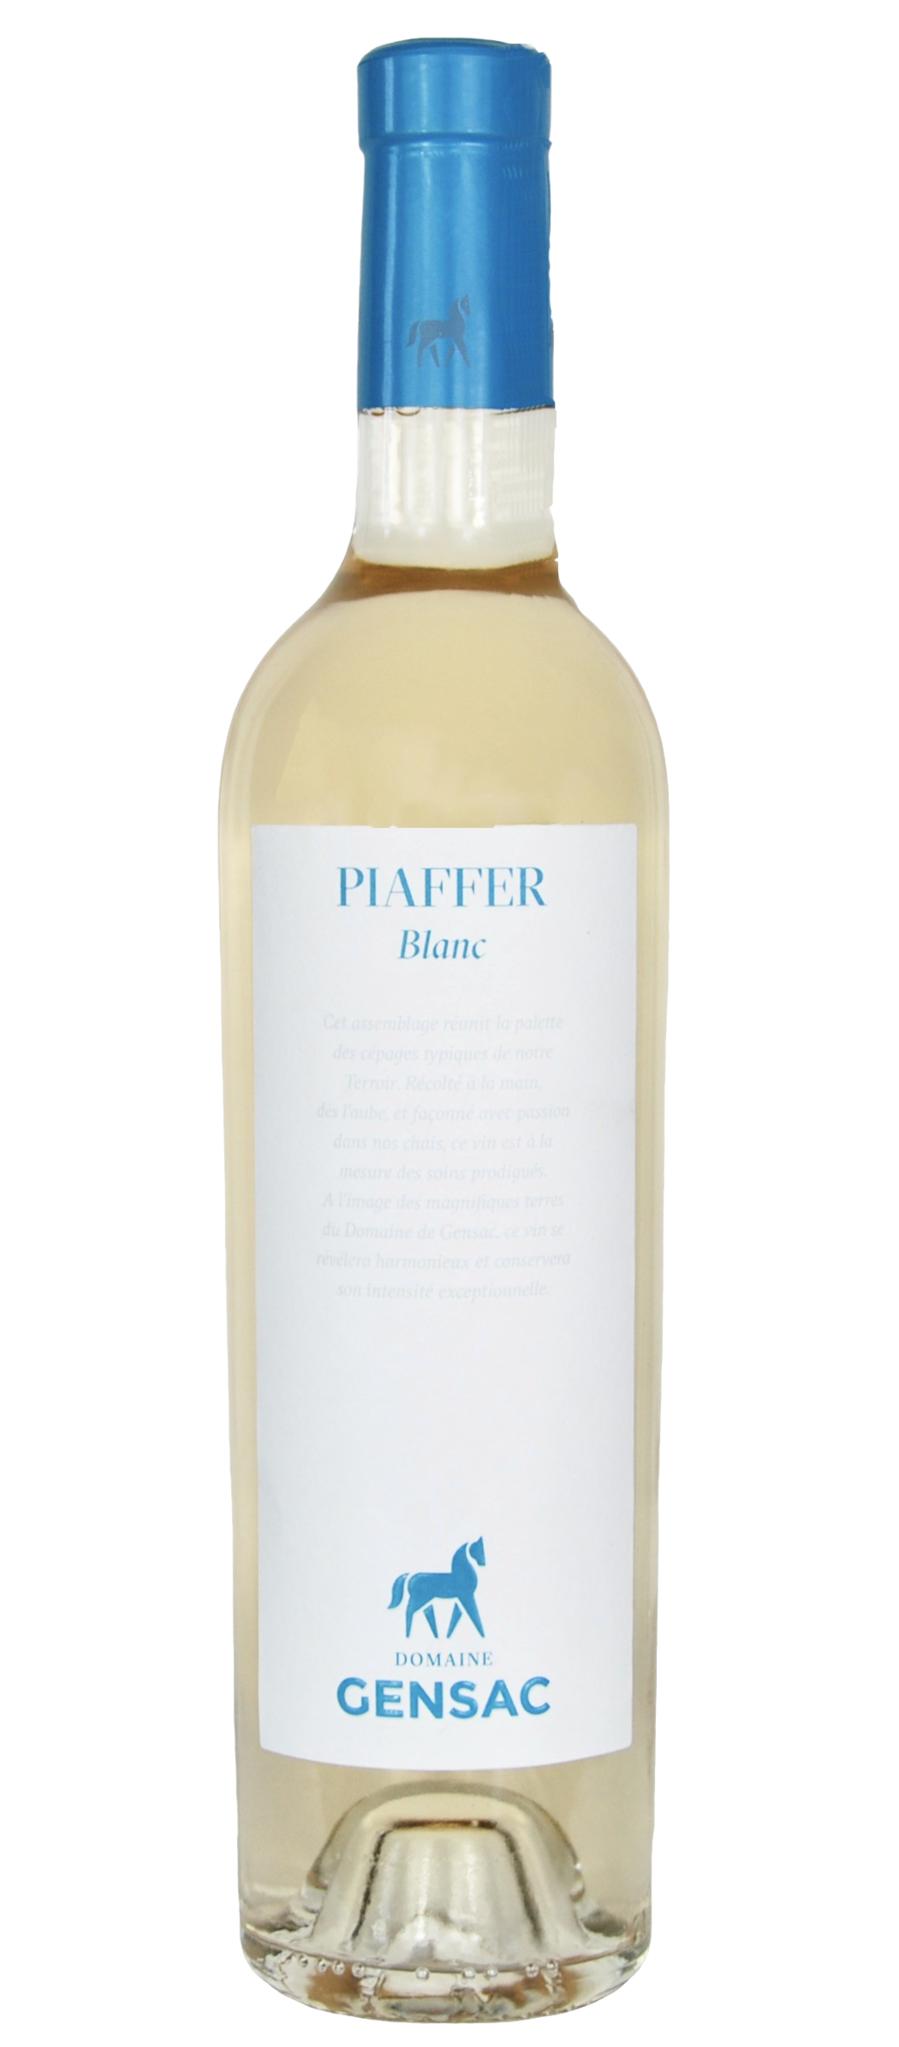 "Domaine Gensac ""Piaffer"" Gers IGP Blanc 2019 750ml"